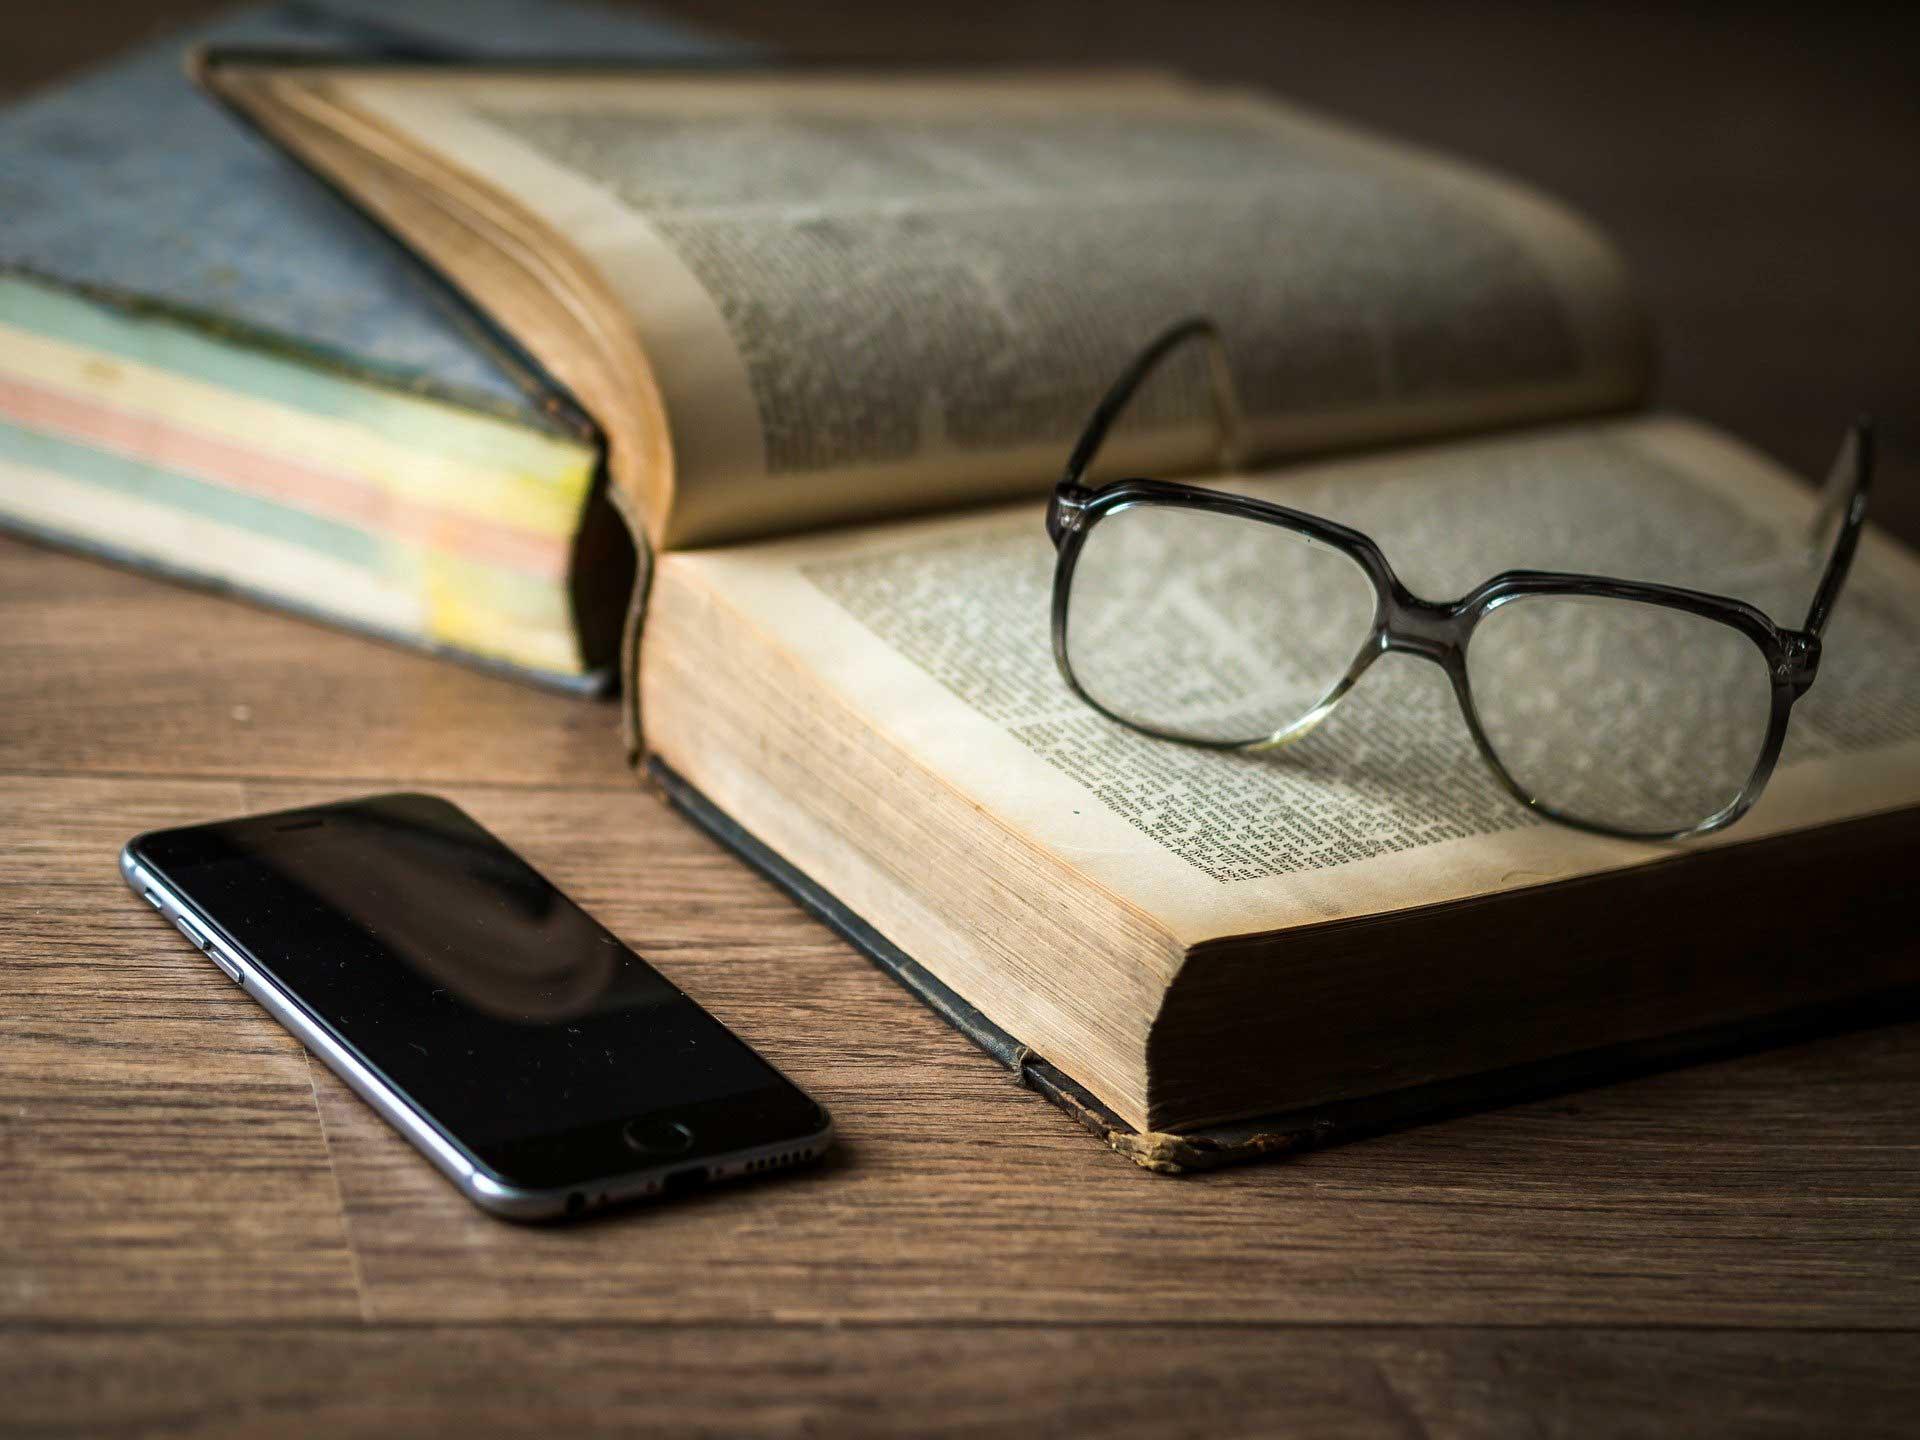 Masa Uzerinde Telefon, Kitap Ve Gozluk